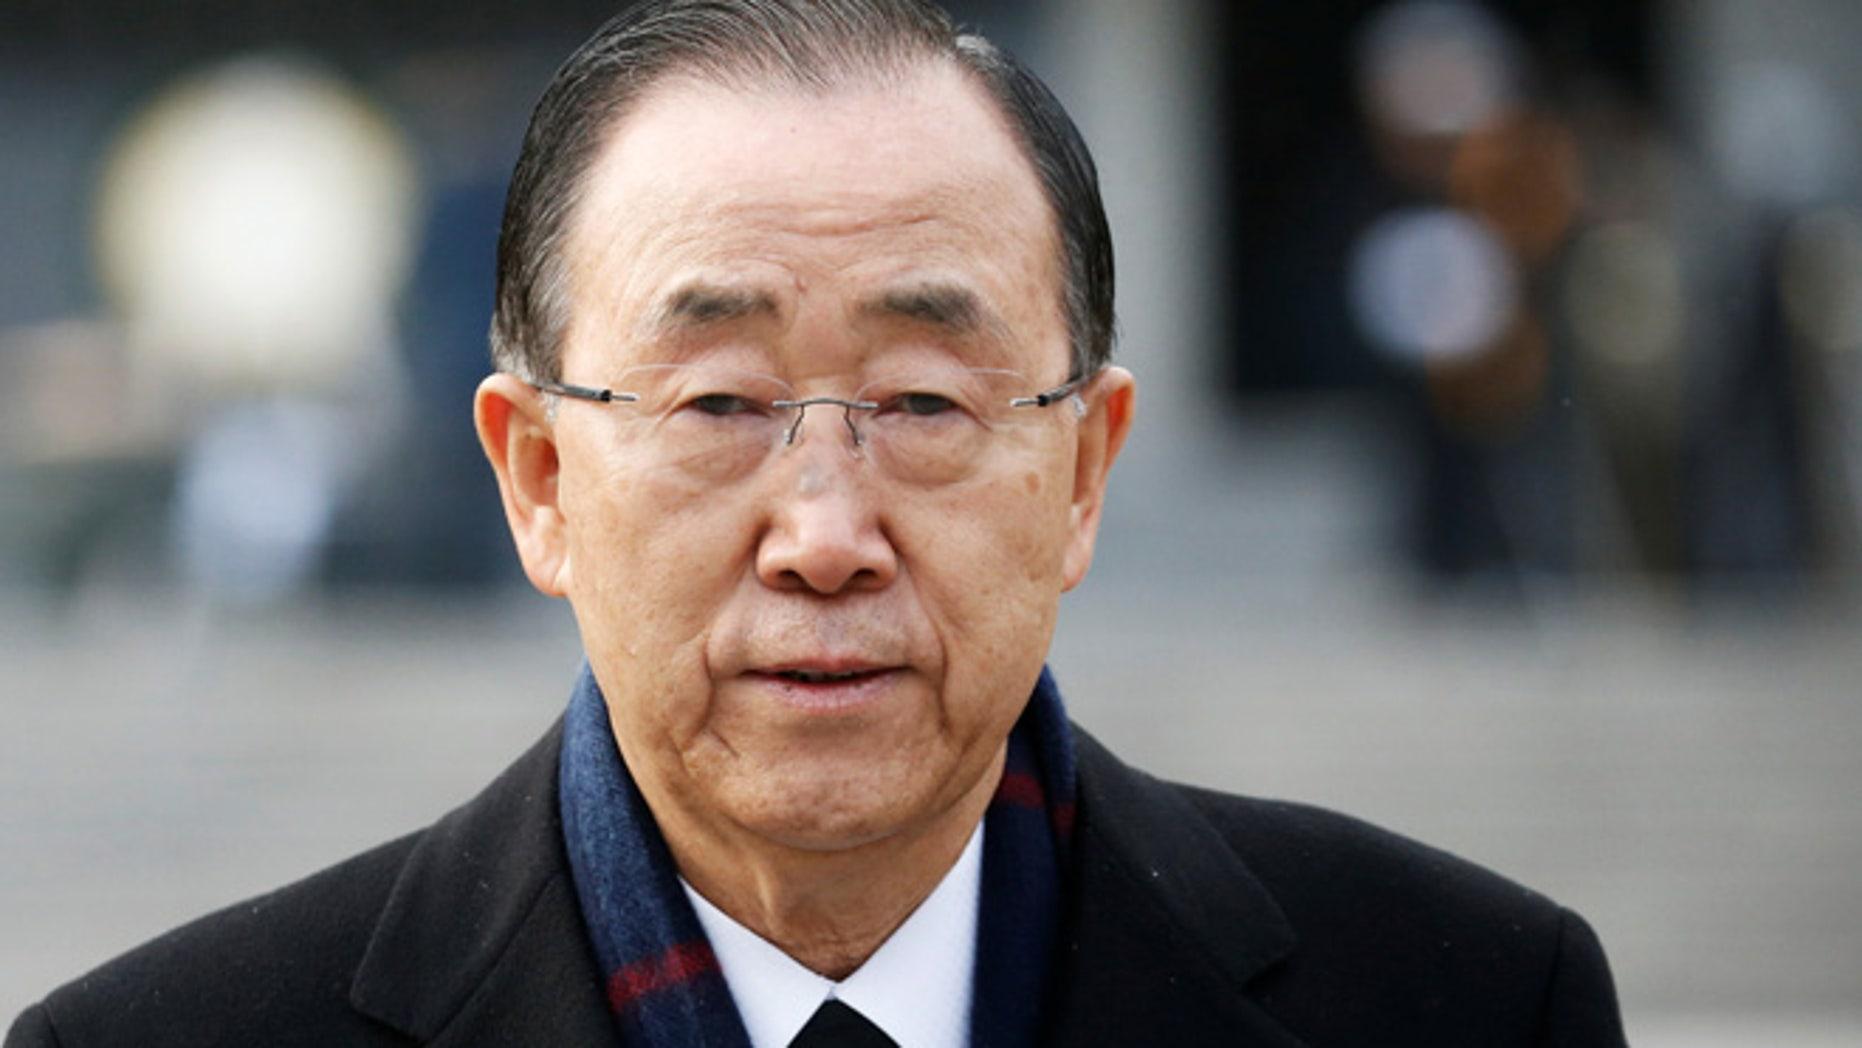 Former U.N. secretary-general Ban Ki-moon leaves after paying a tribute at the natioanl cemetery in Seoul, South Korea, January 13, 2017.  REUTERS/Kim Hong-Ji - RTX2YQGJ